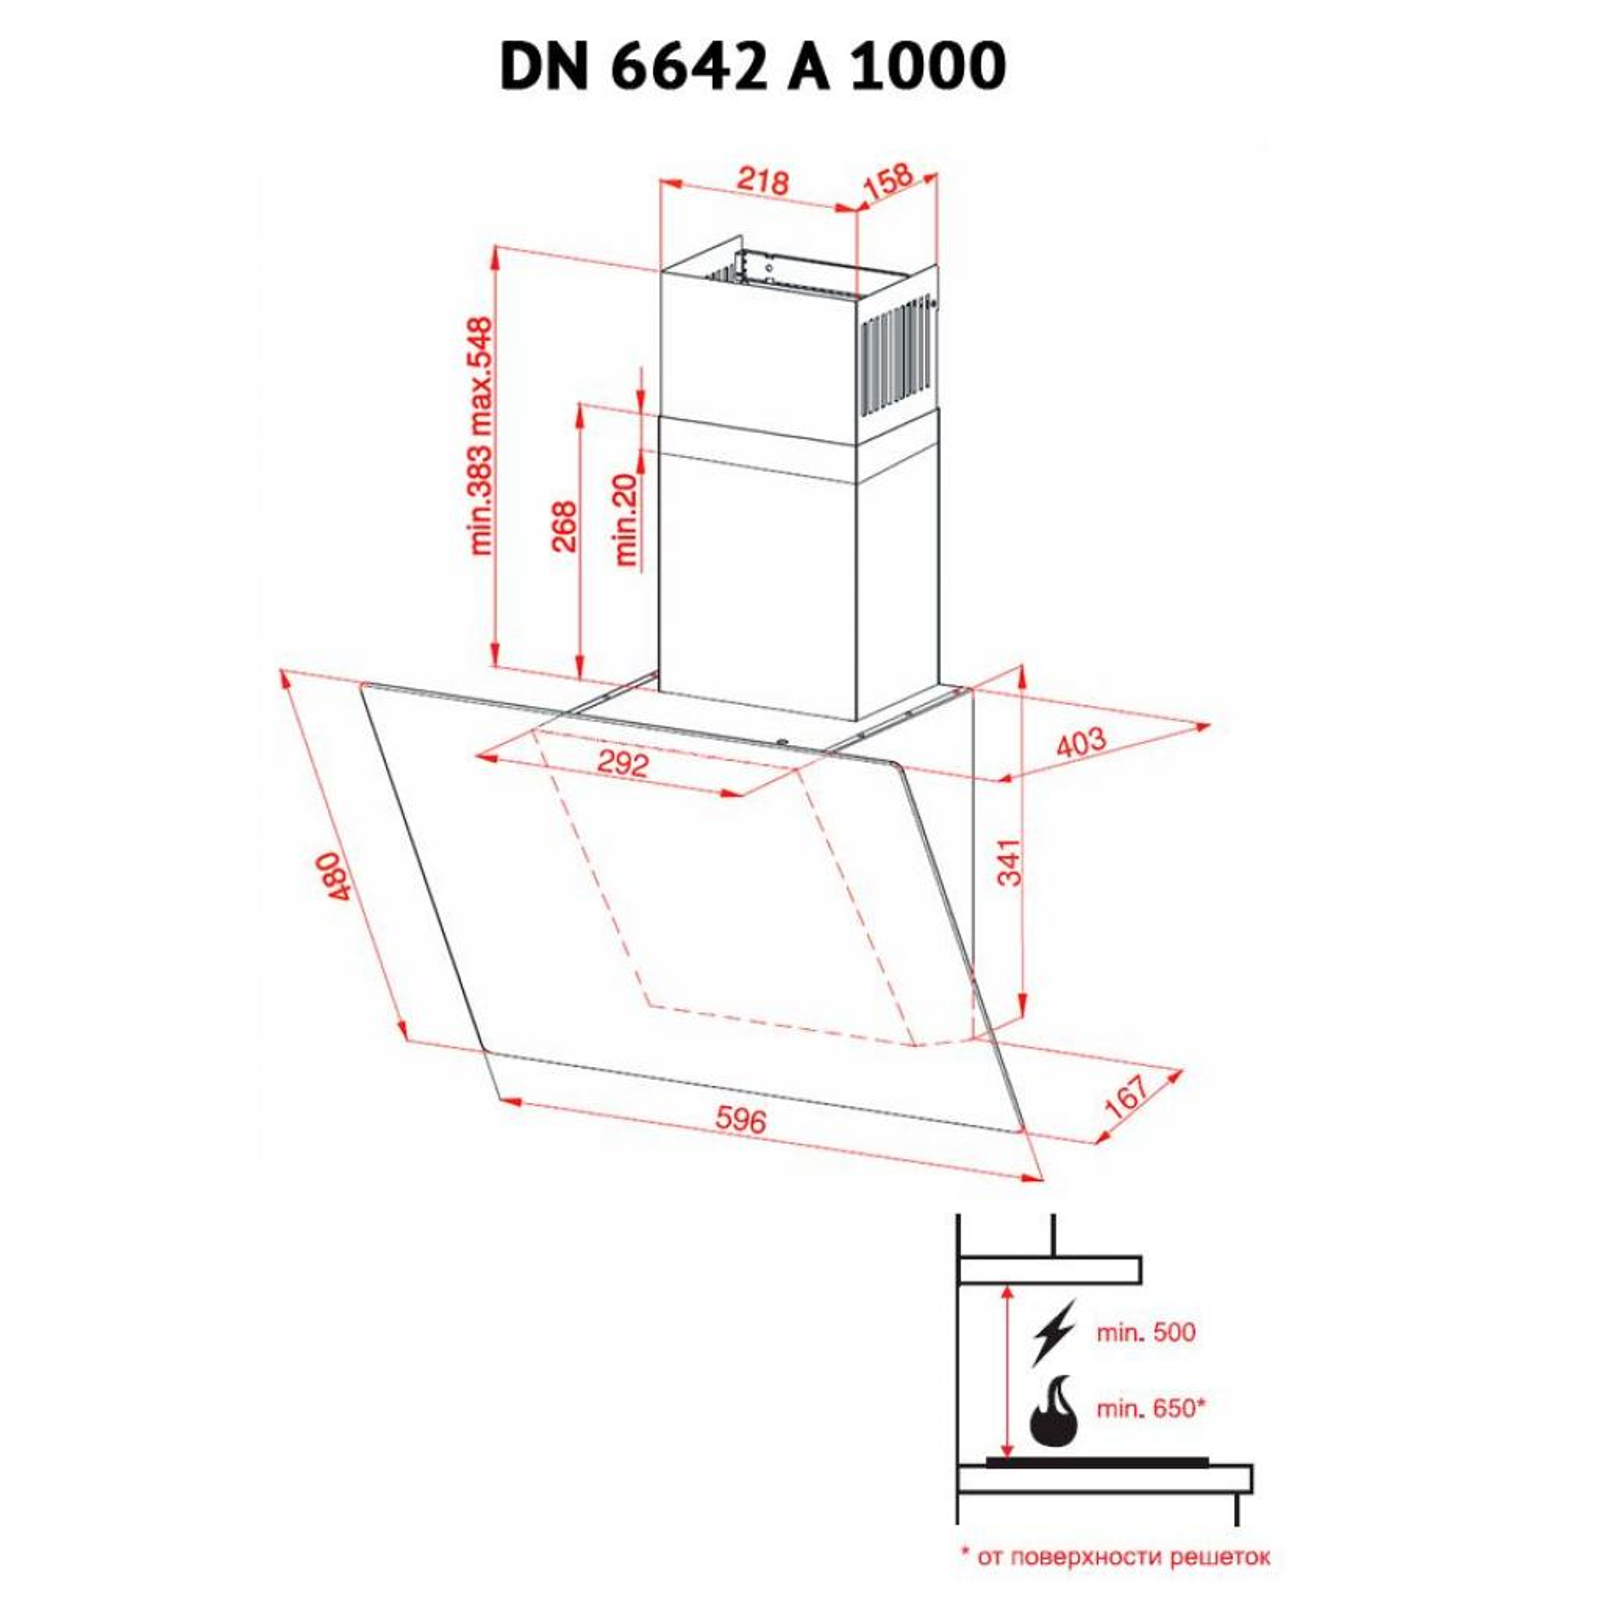 Вытяжка кухонная PERFELLI DN 6642 A 1000 IV LED изображение 7